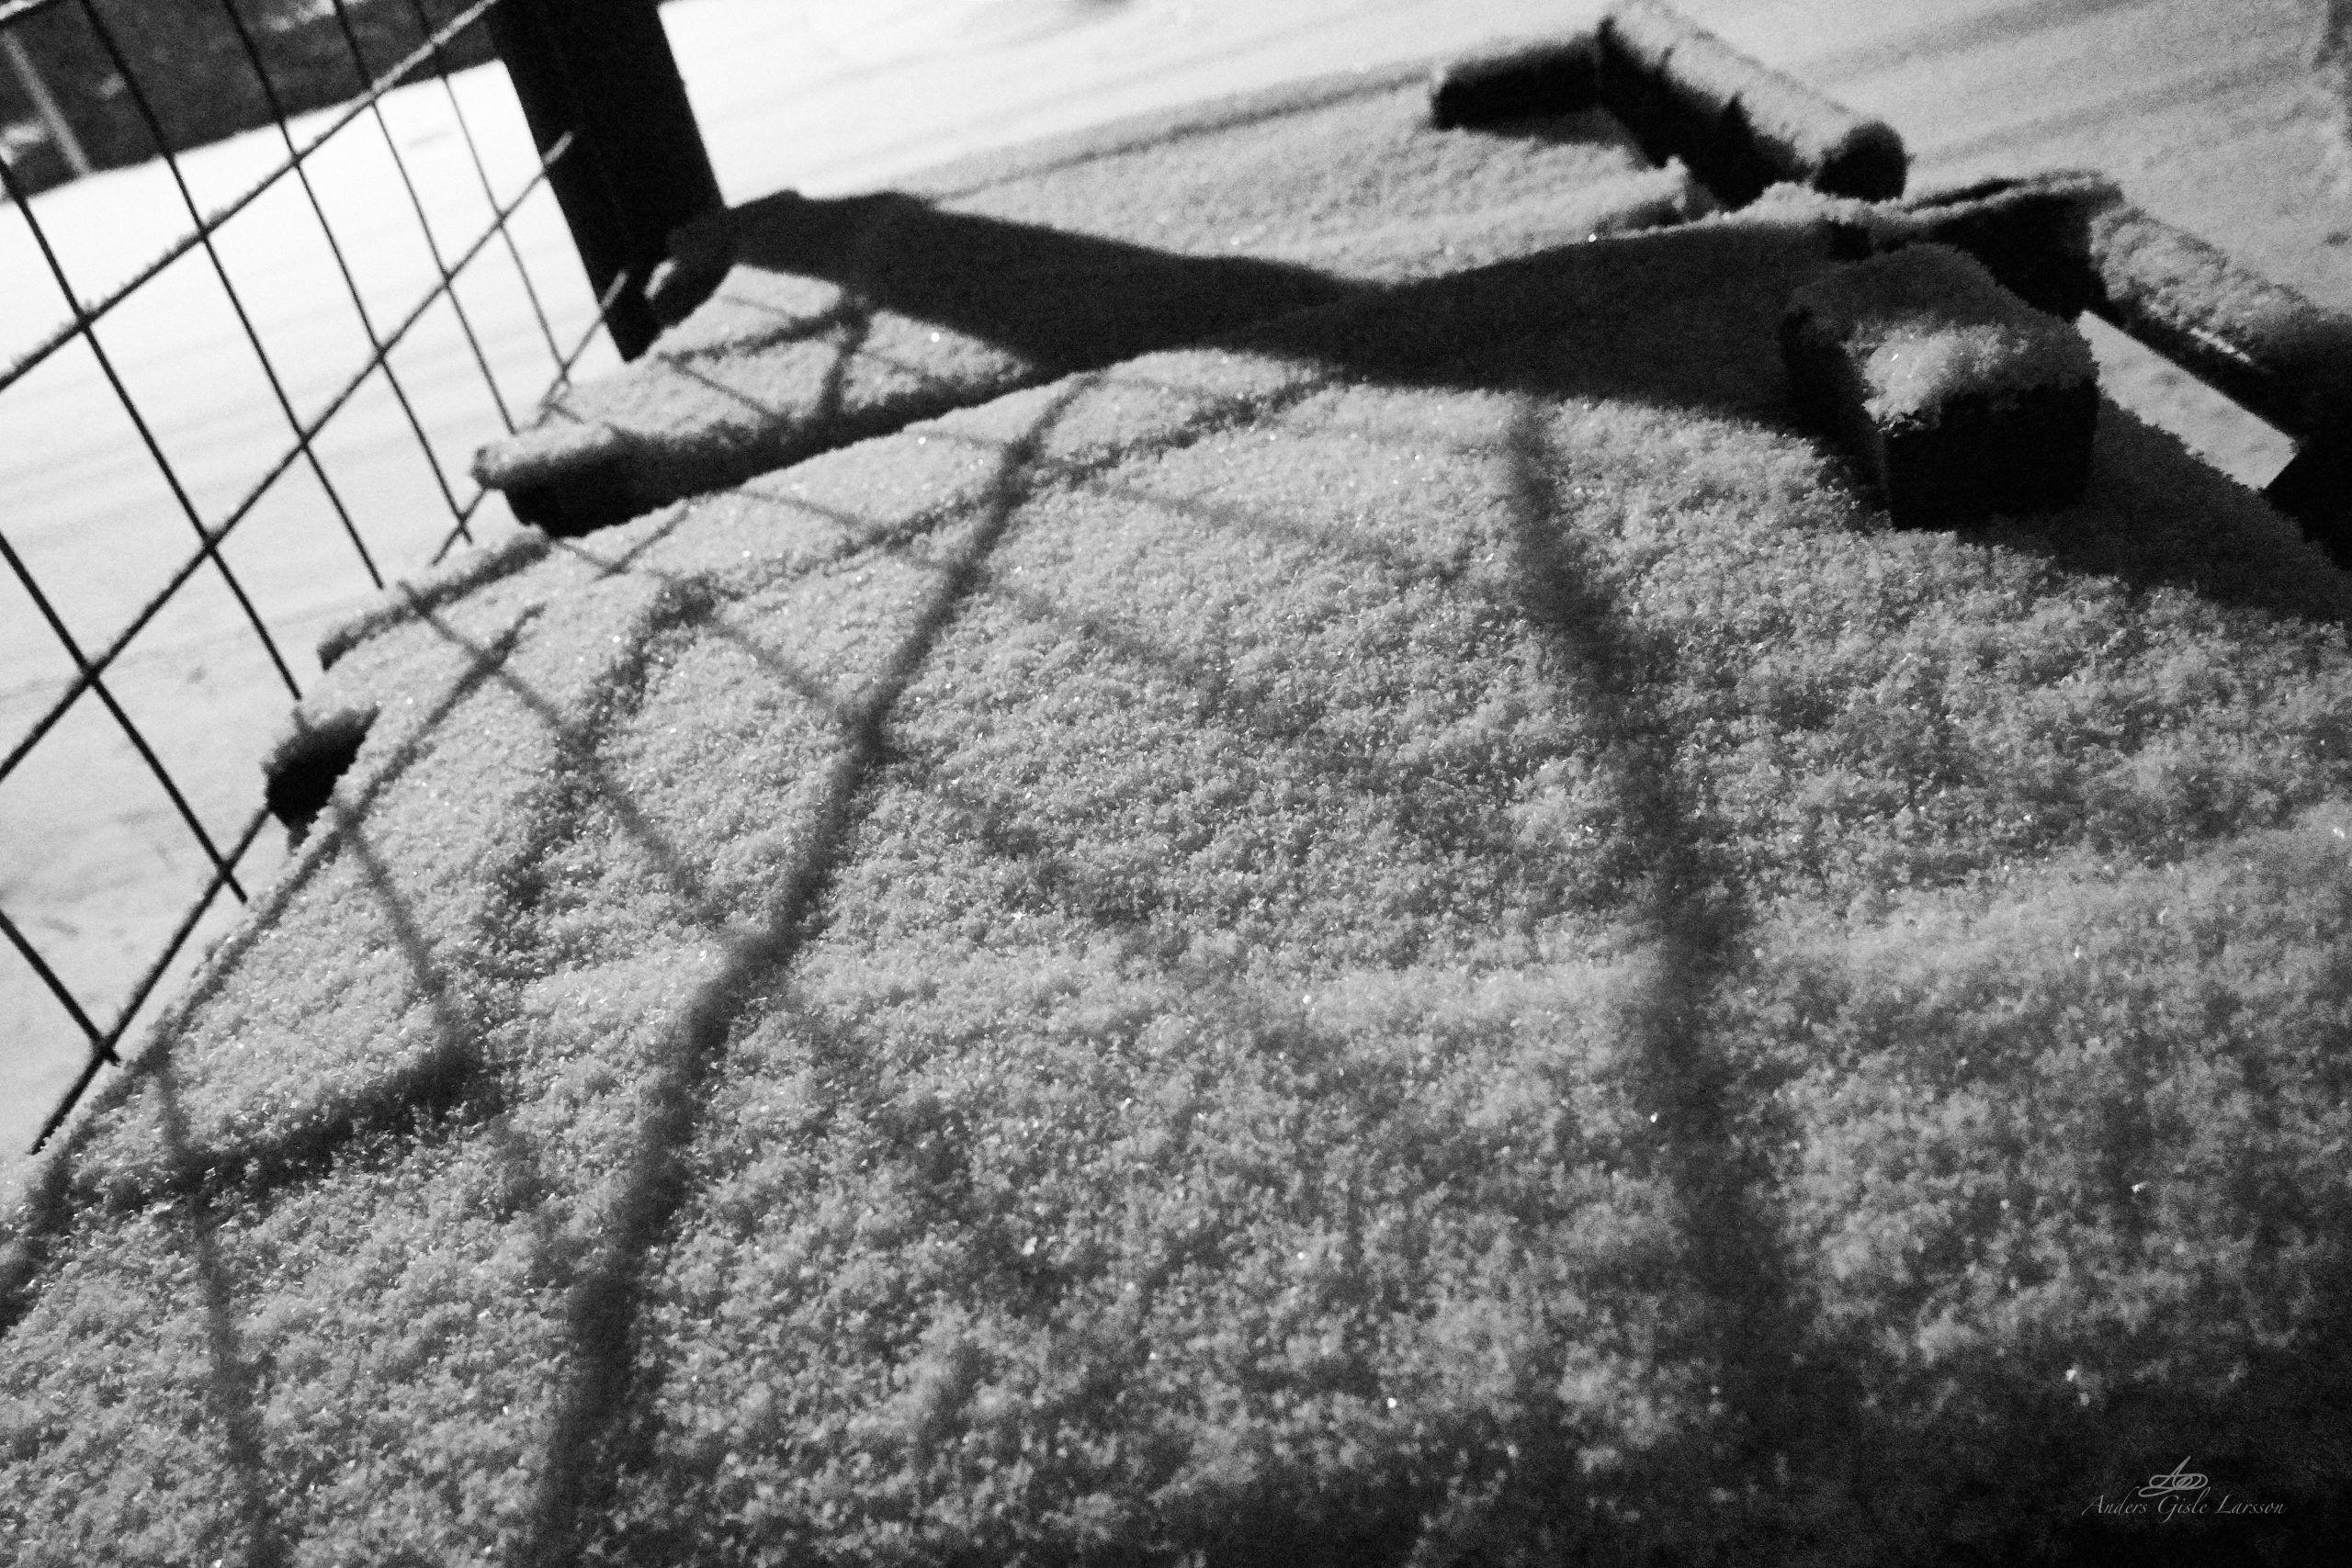 Let falder sneen, Fri leg, Uge 10, 66/365, Assentoft, Randers